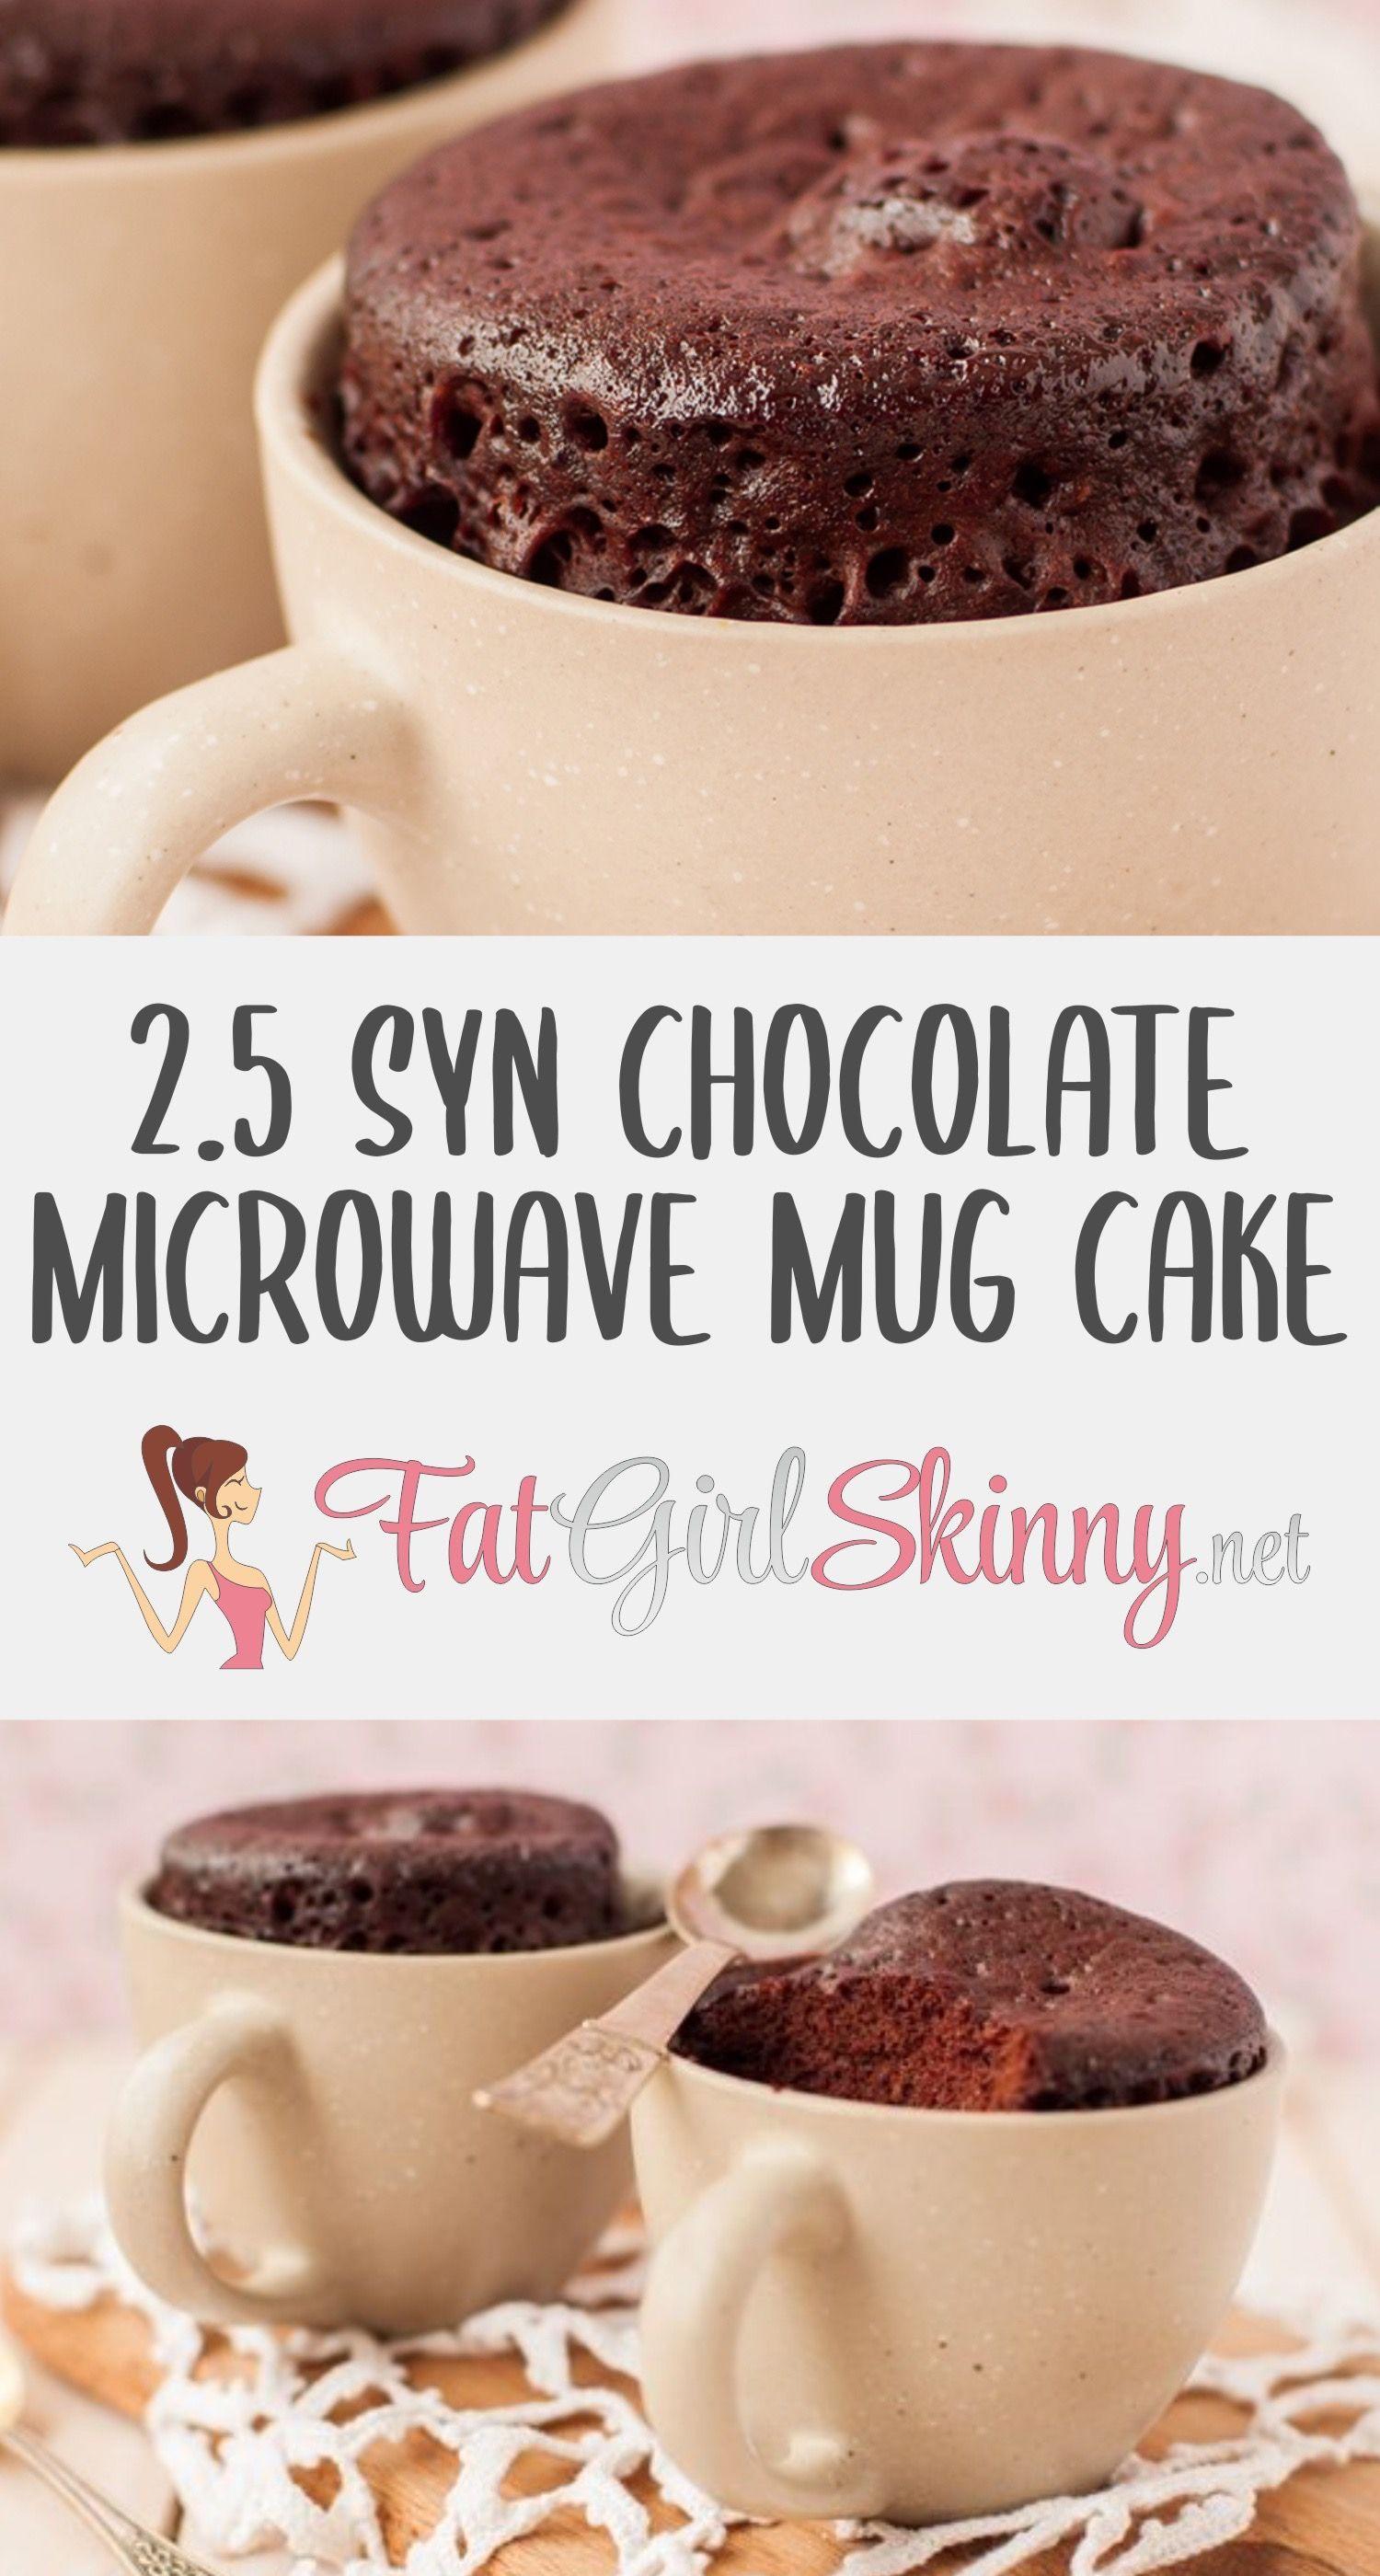 2.5 Syn Chocolate Microwave Mug Cake | Fatgirlskinny.net | Slimming World Recipes & More